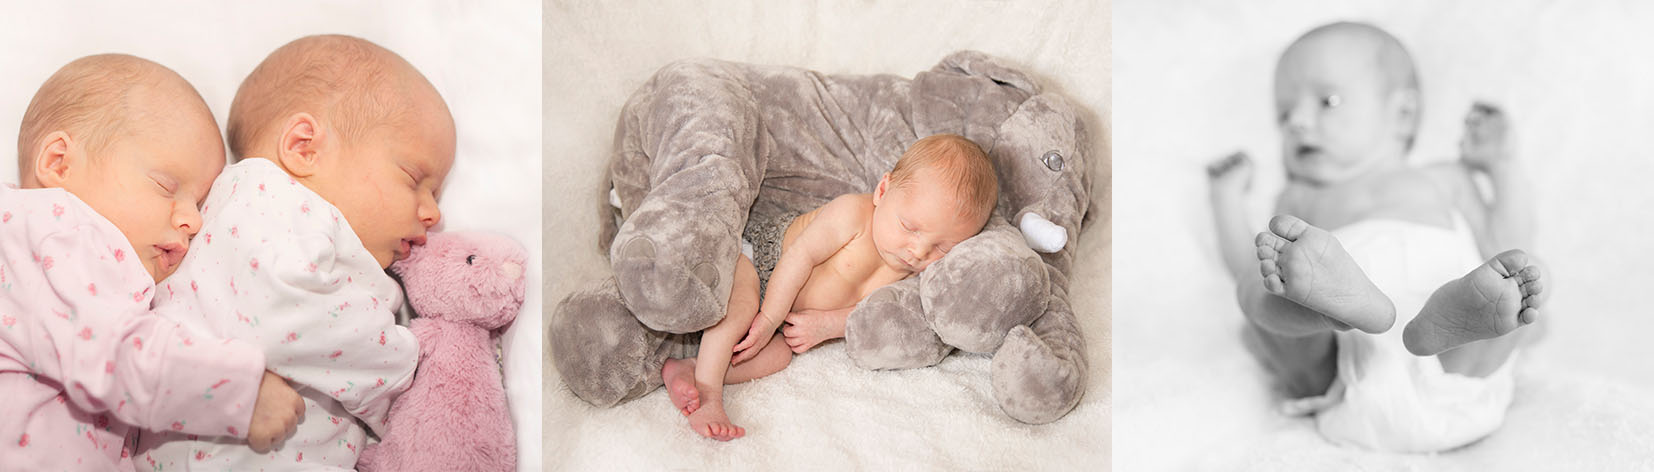 Harrogate Newborn baby photography